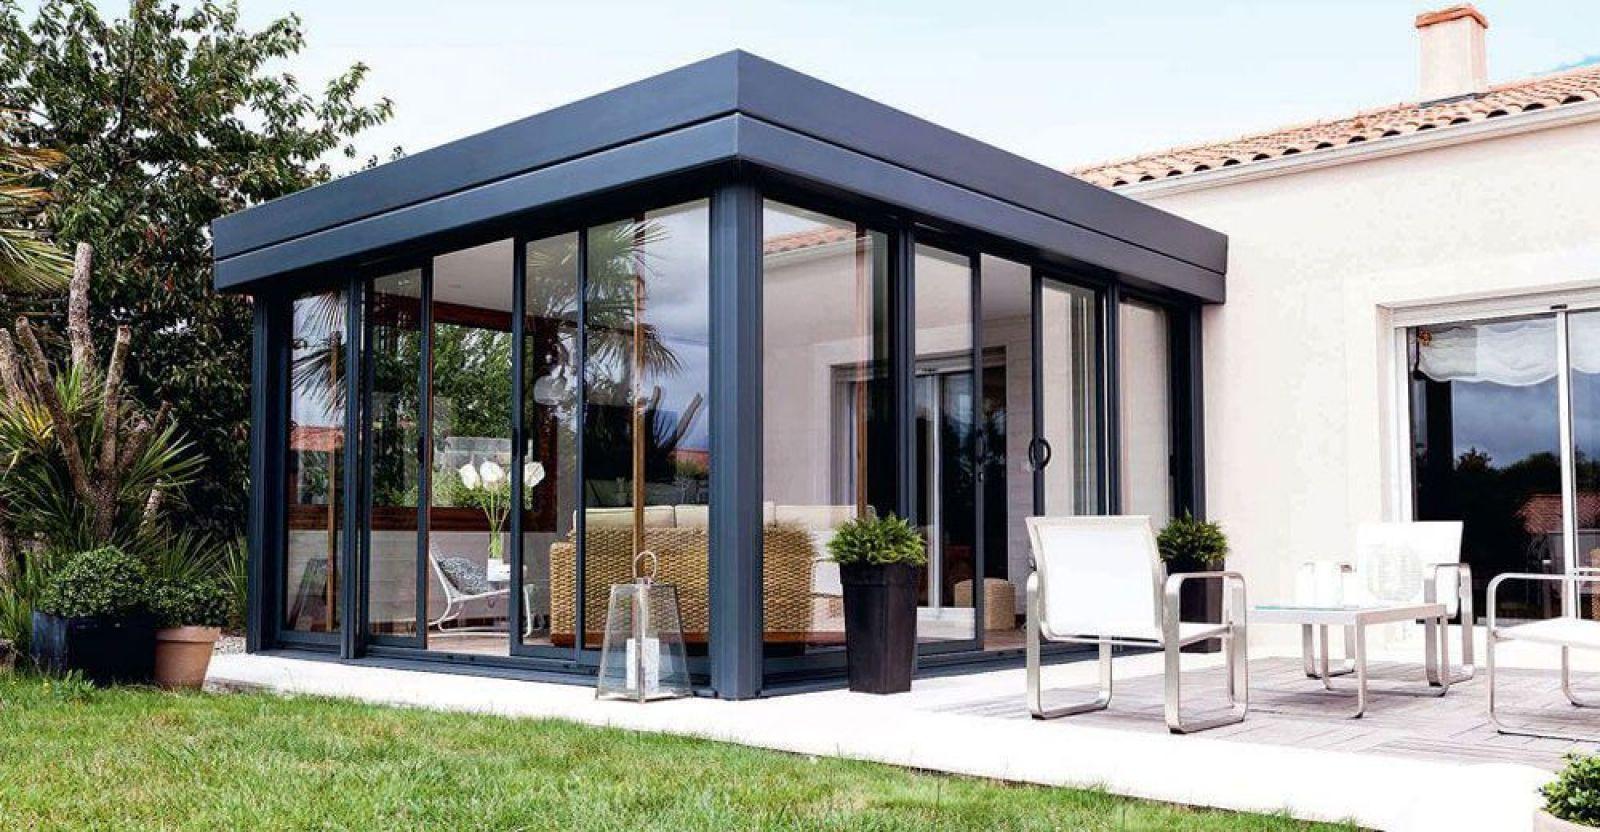 Veranda Metal Et Verre image result for veranda moderne   small patio, pergola